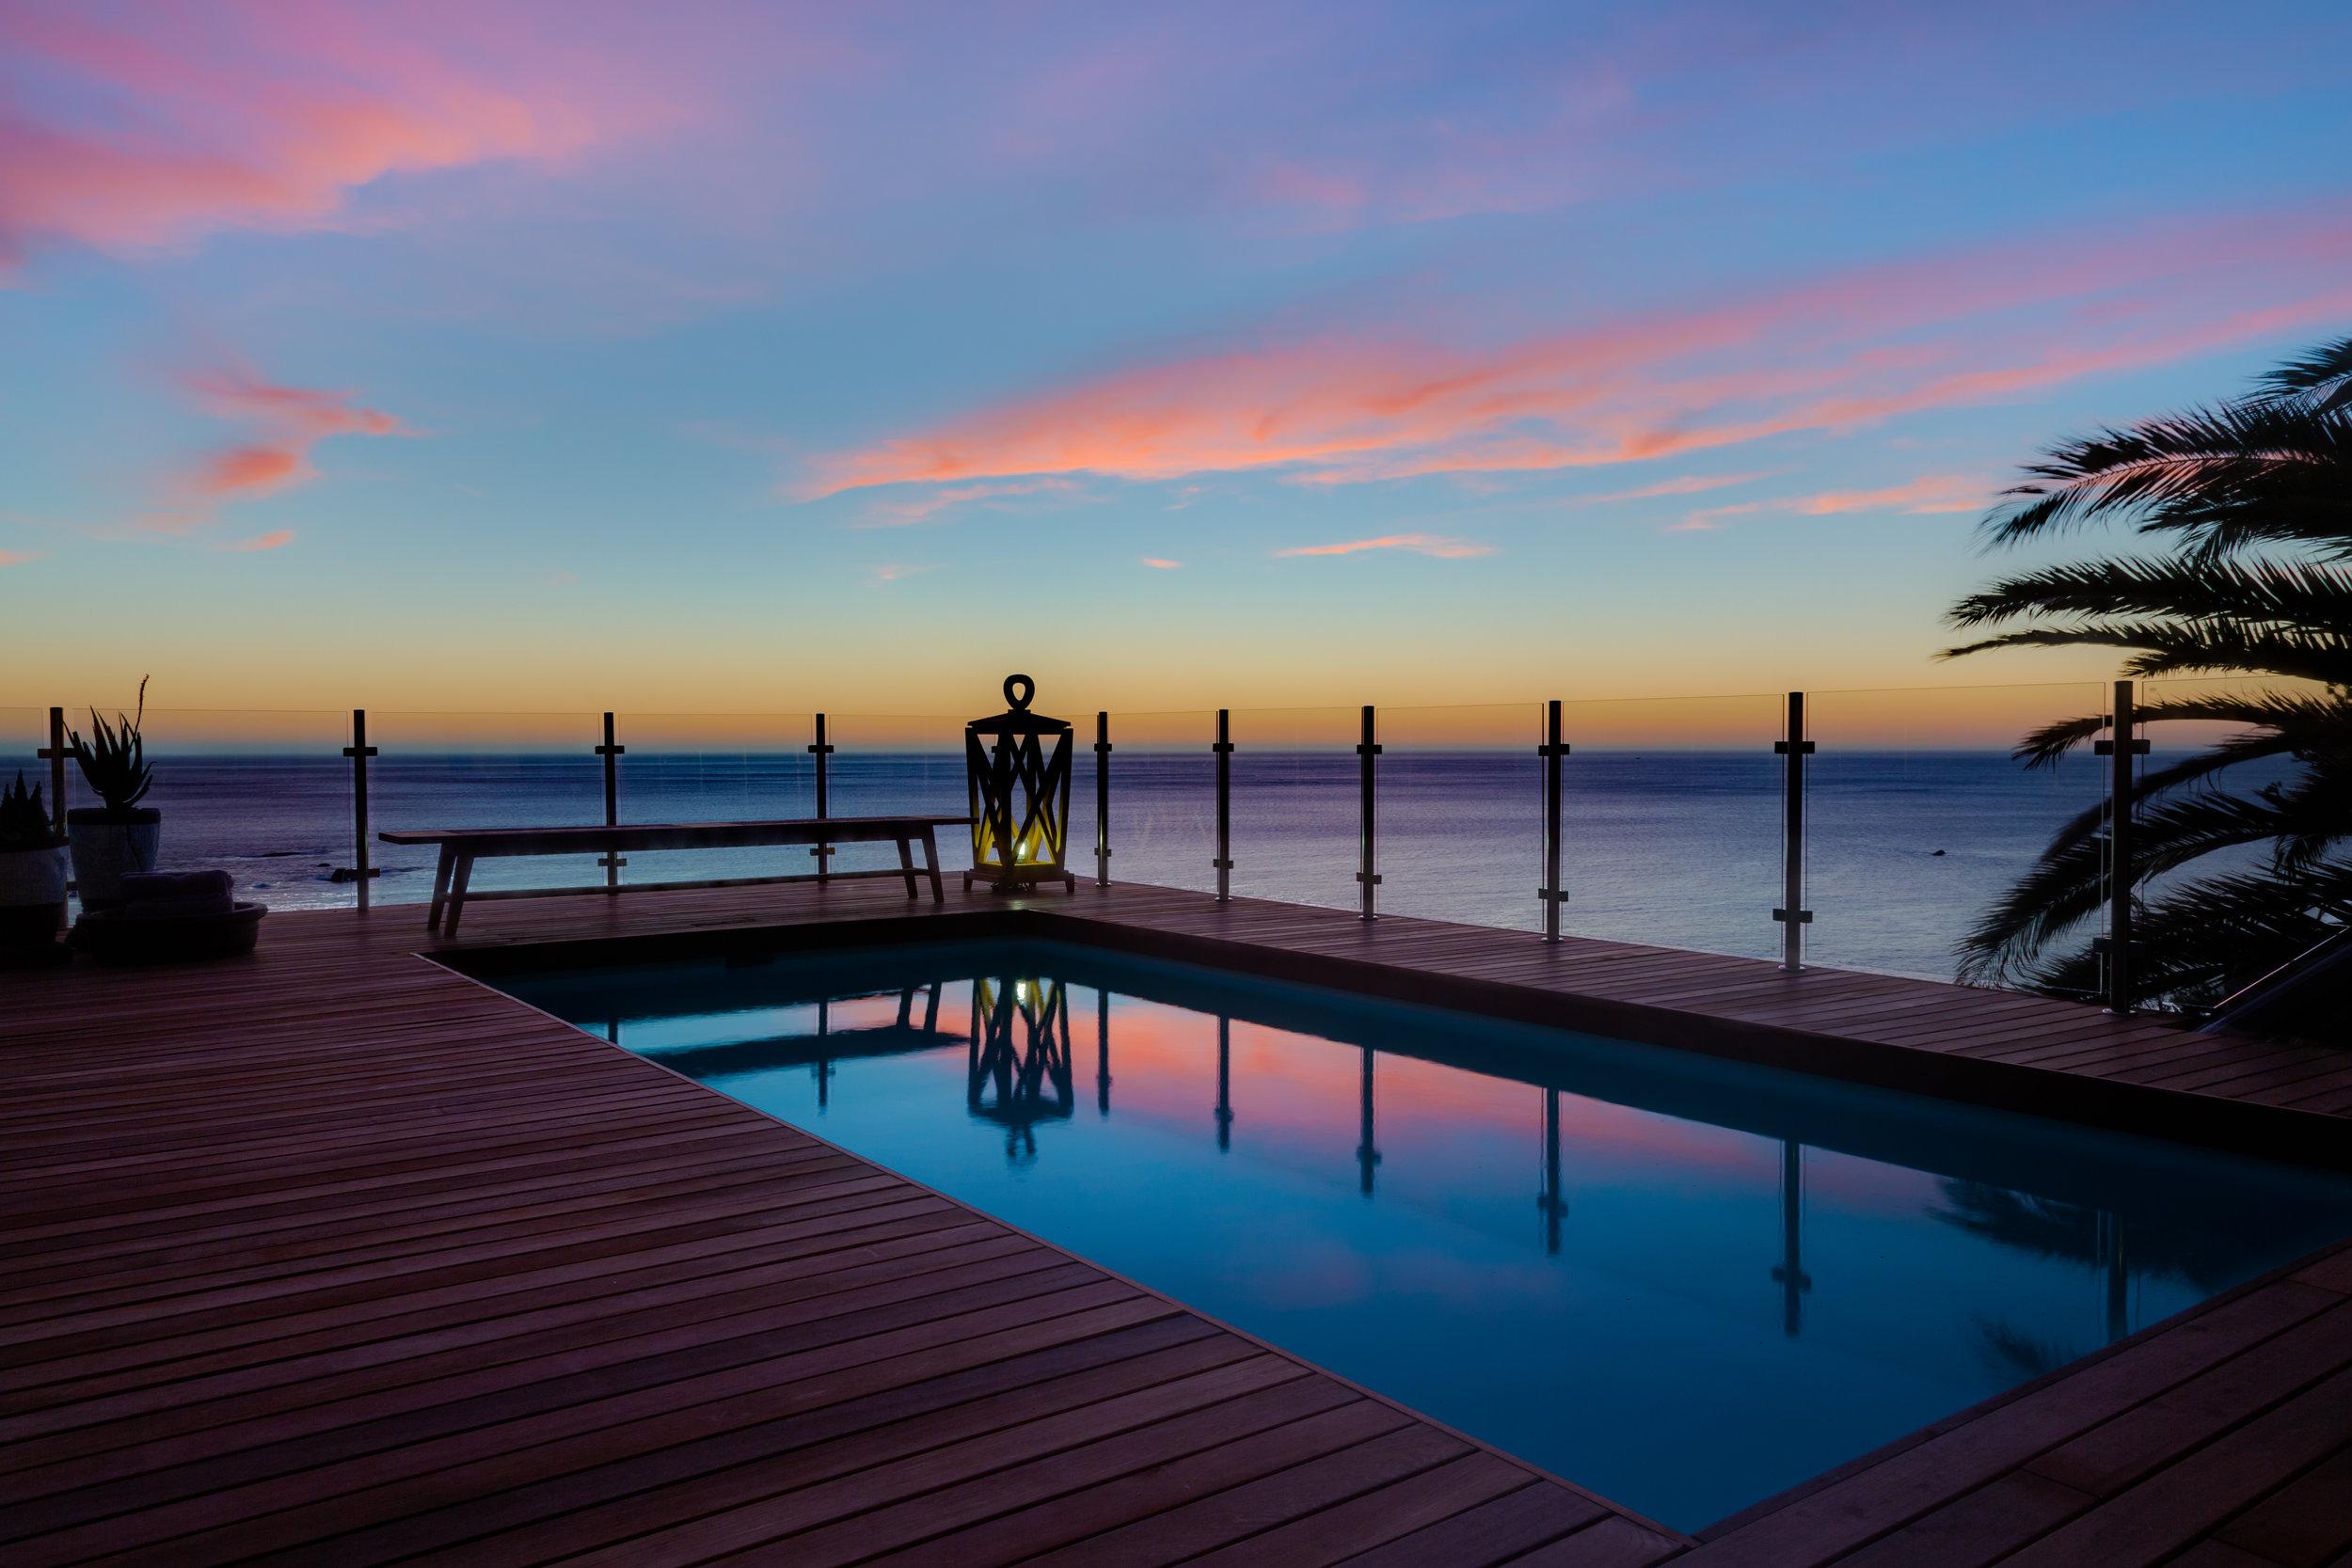 sunset on pool deck 5.jpg